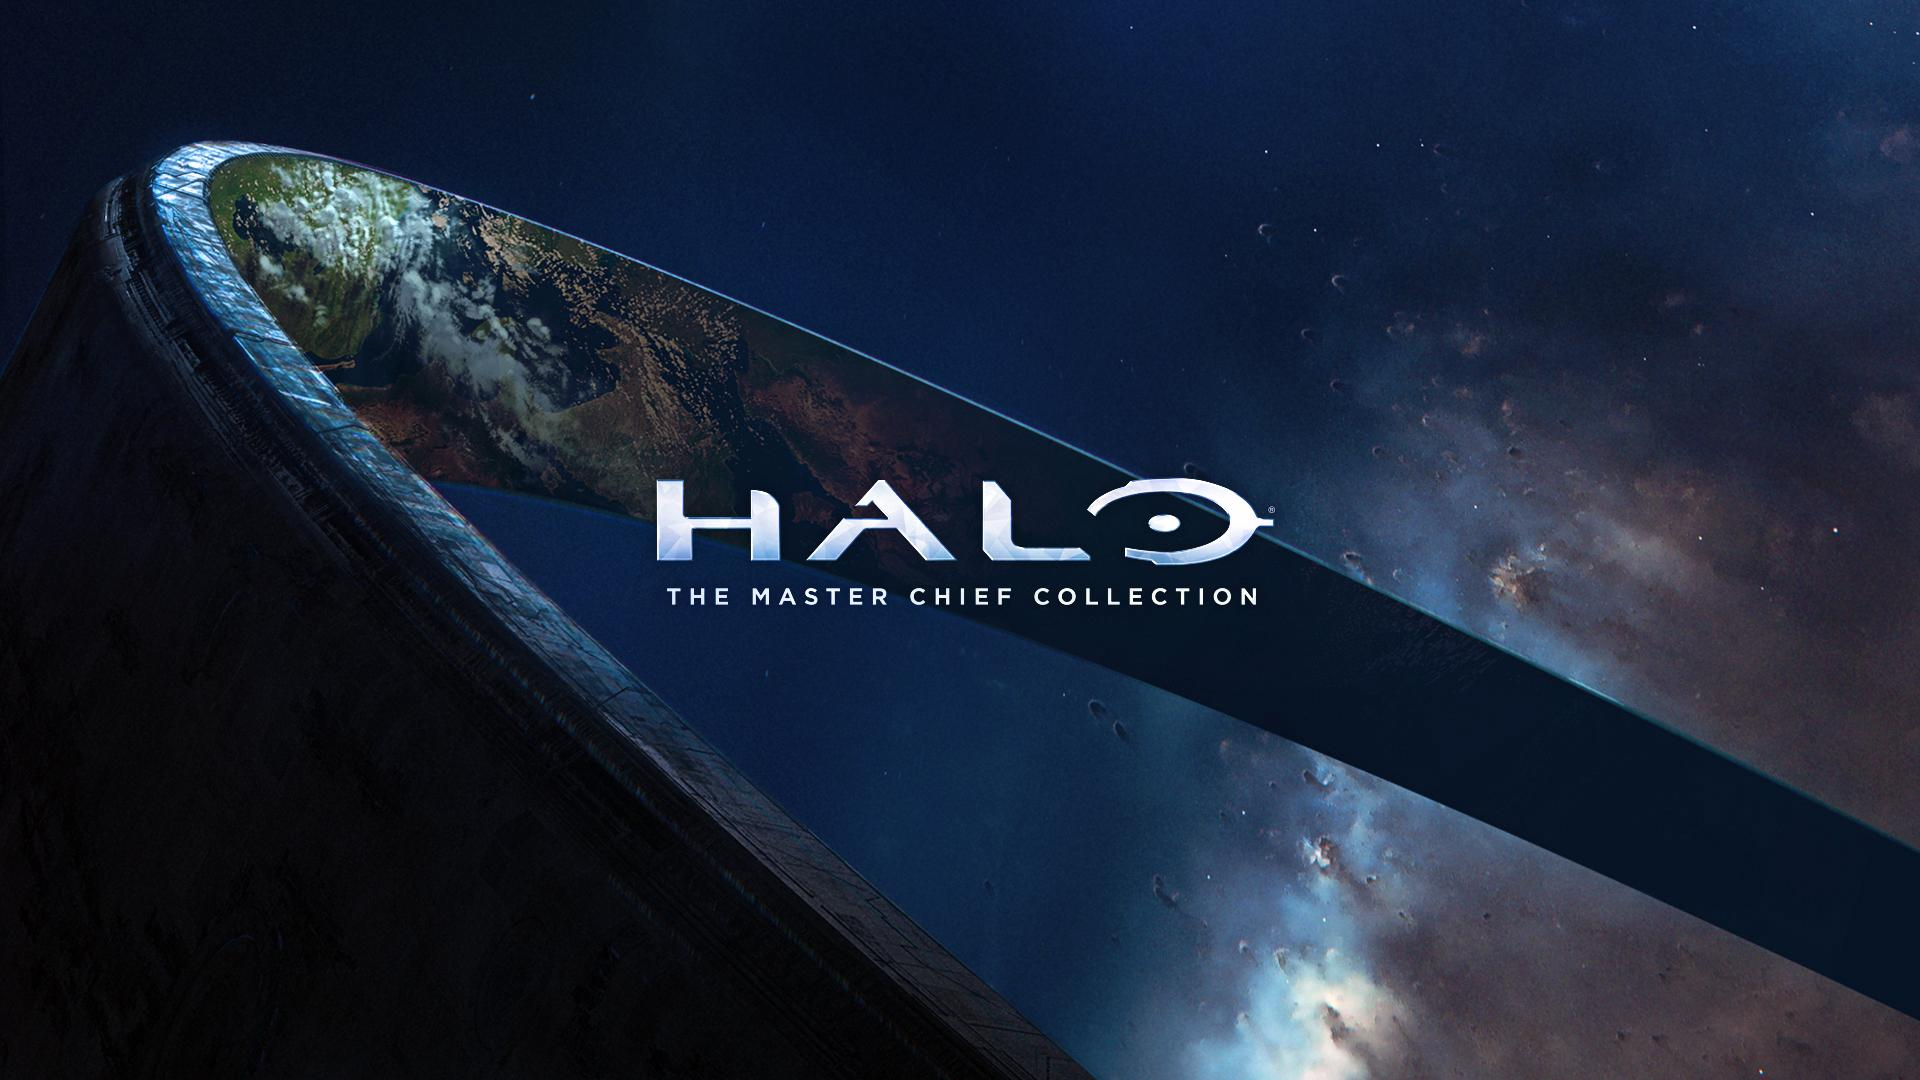 Halo Infinite 4k Wallpapers Top Free Halo Infinite 4k Backgrounds